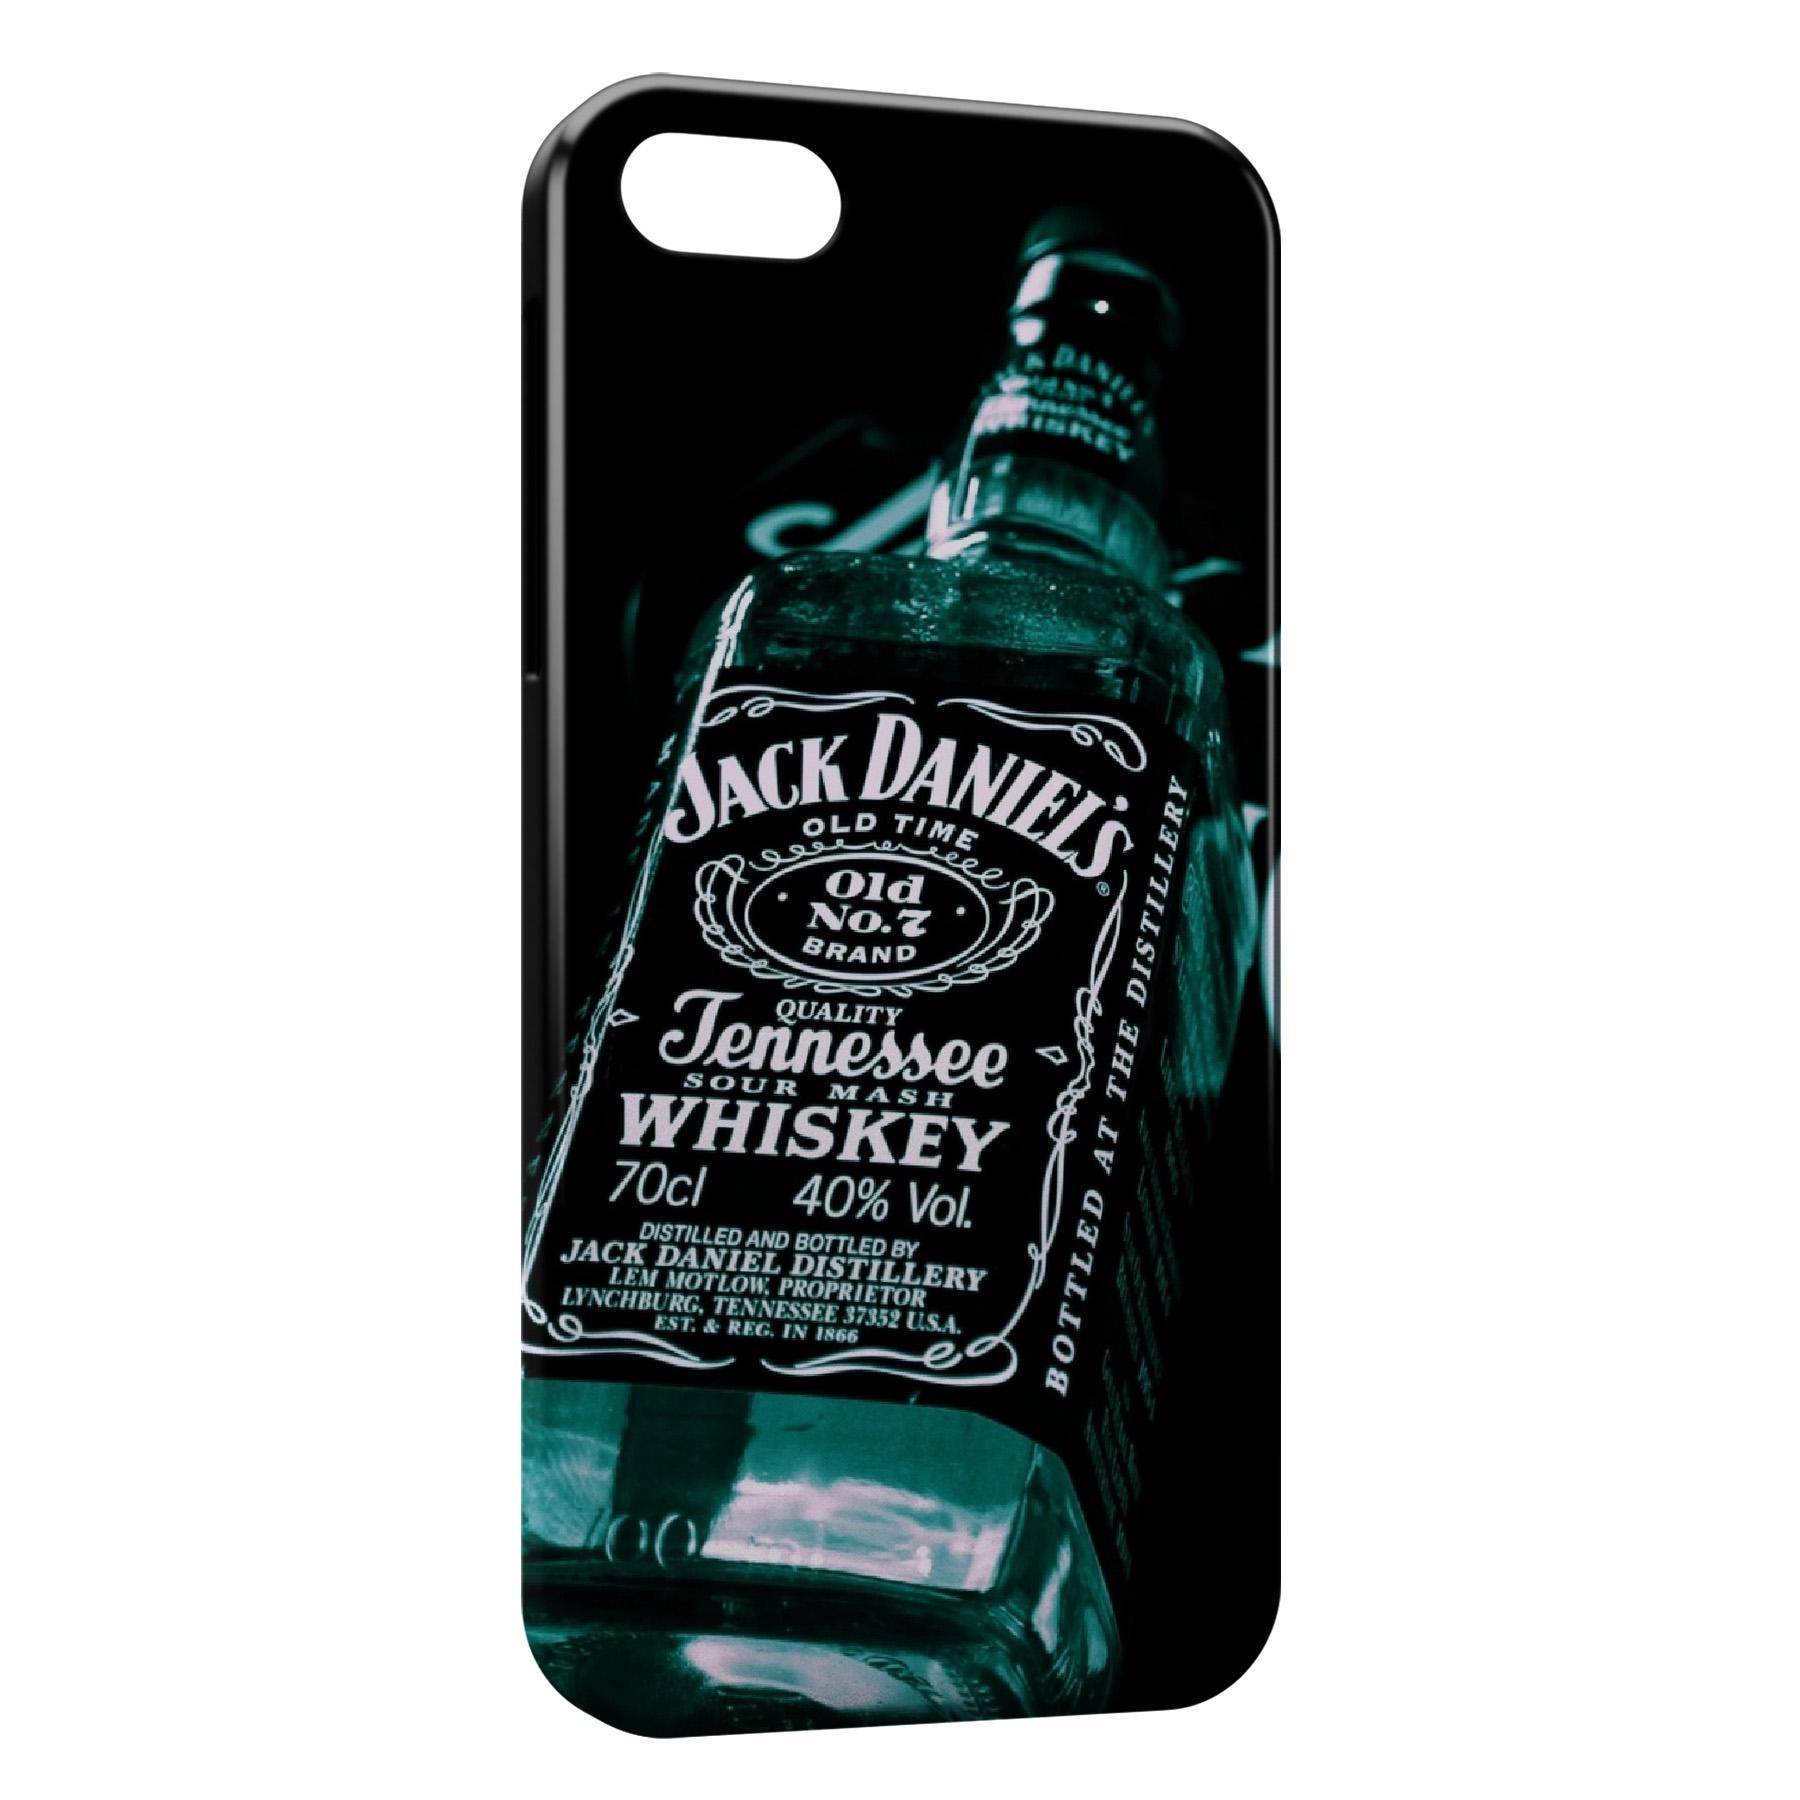 Coque iPhone 7 7 Plus Jack Daniels Black Gold